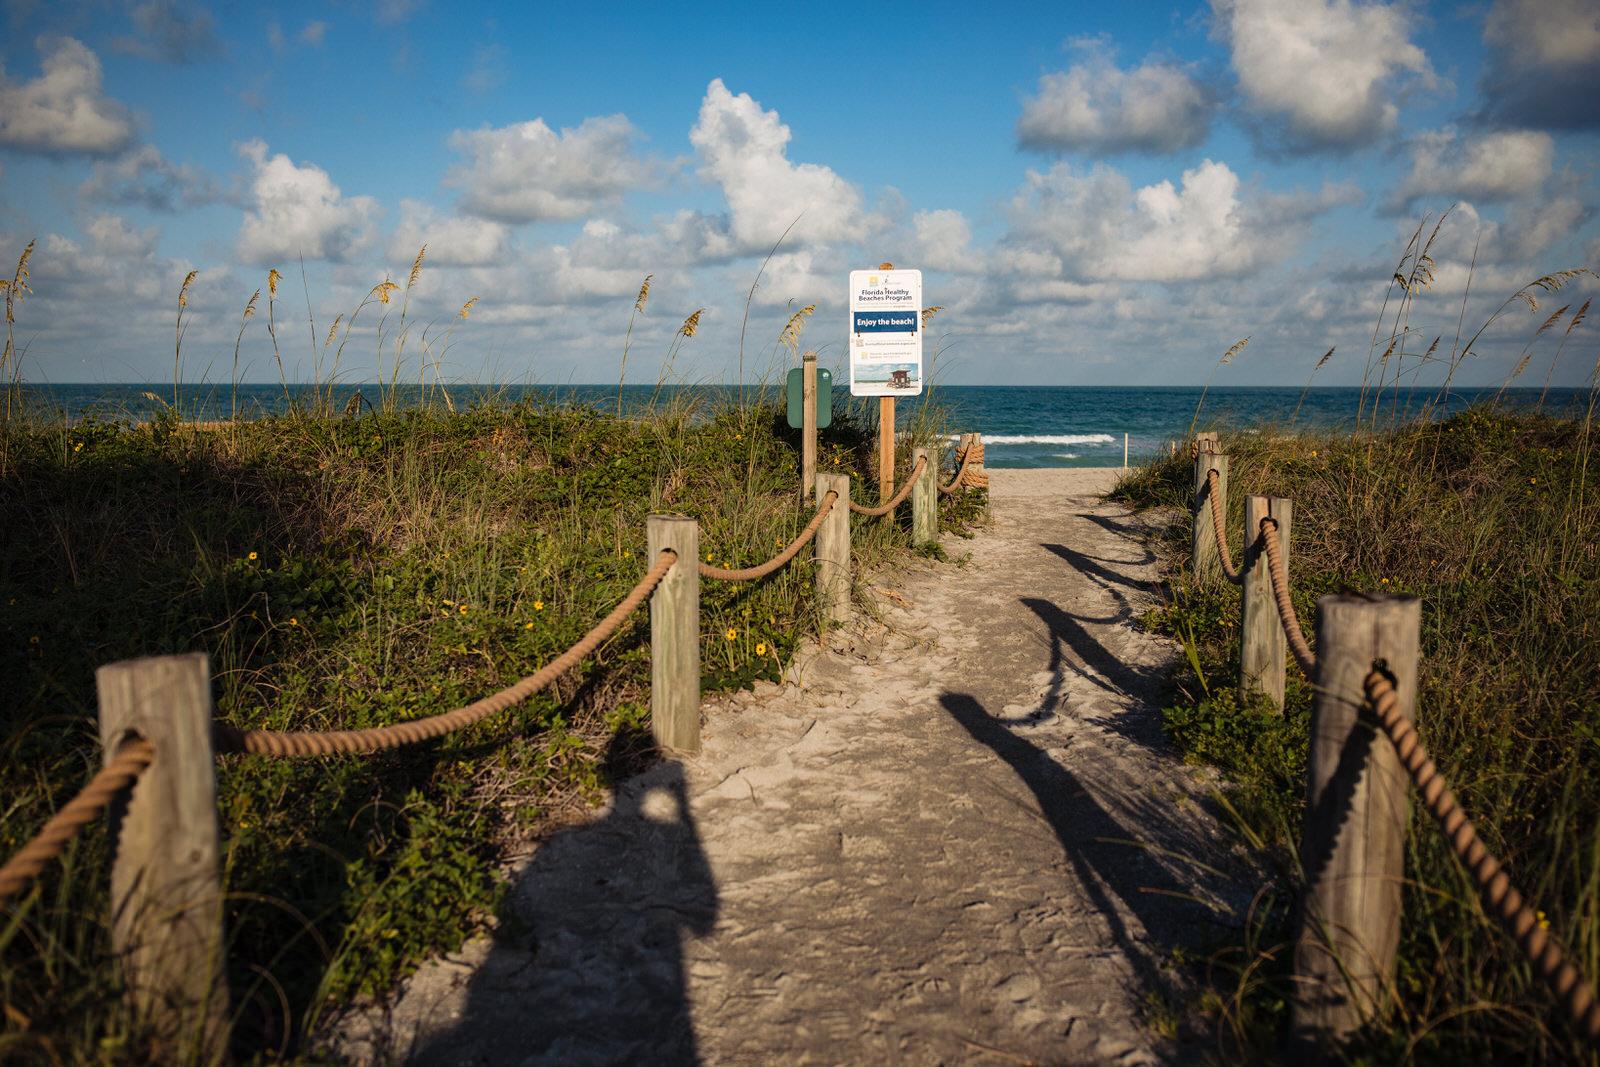 siesta-key-florida-tiny-house-photo-vacation-beach-nature-macro-10.jpg